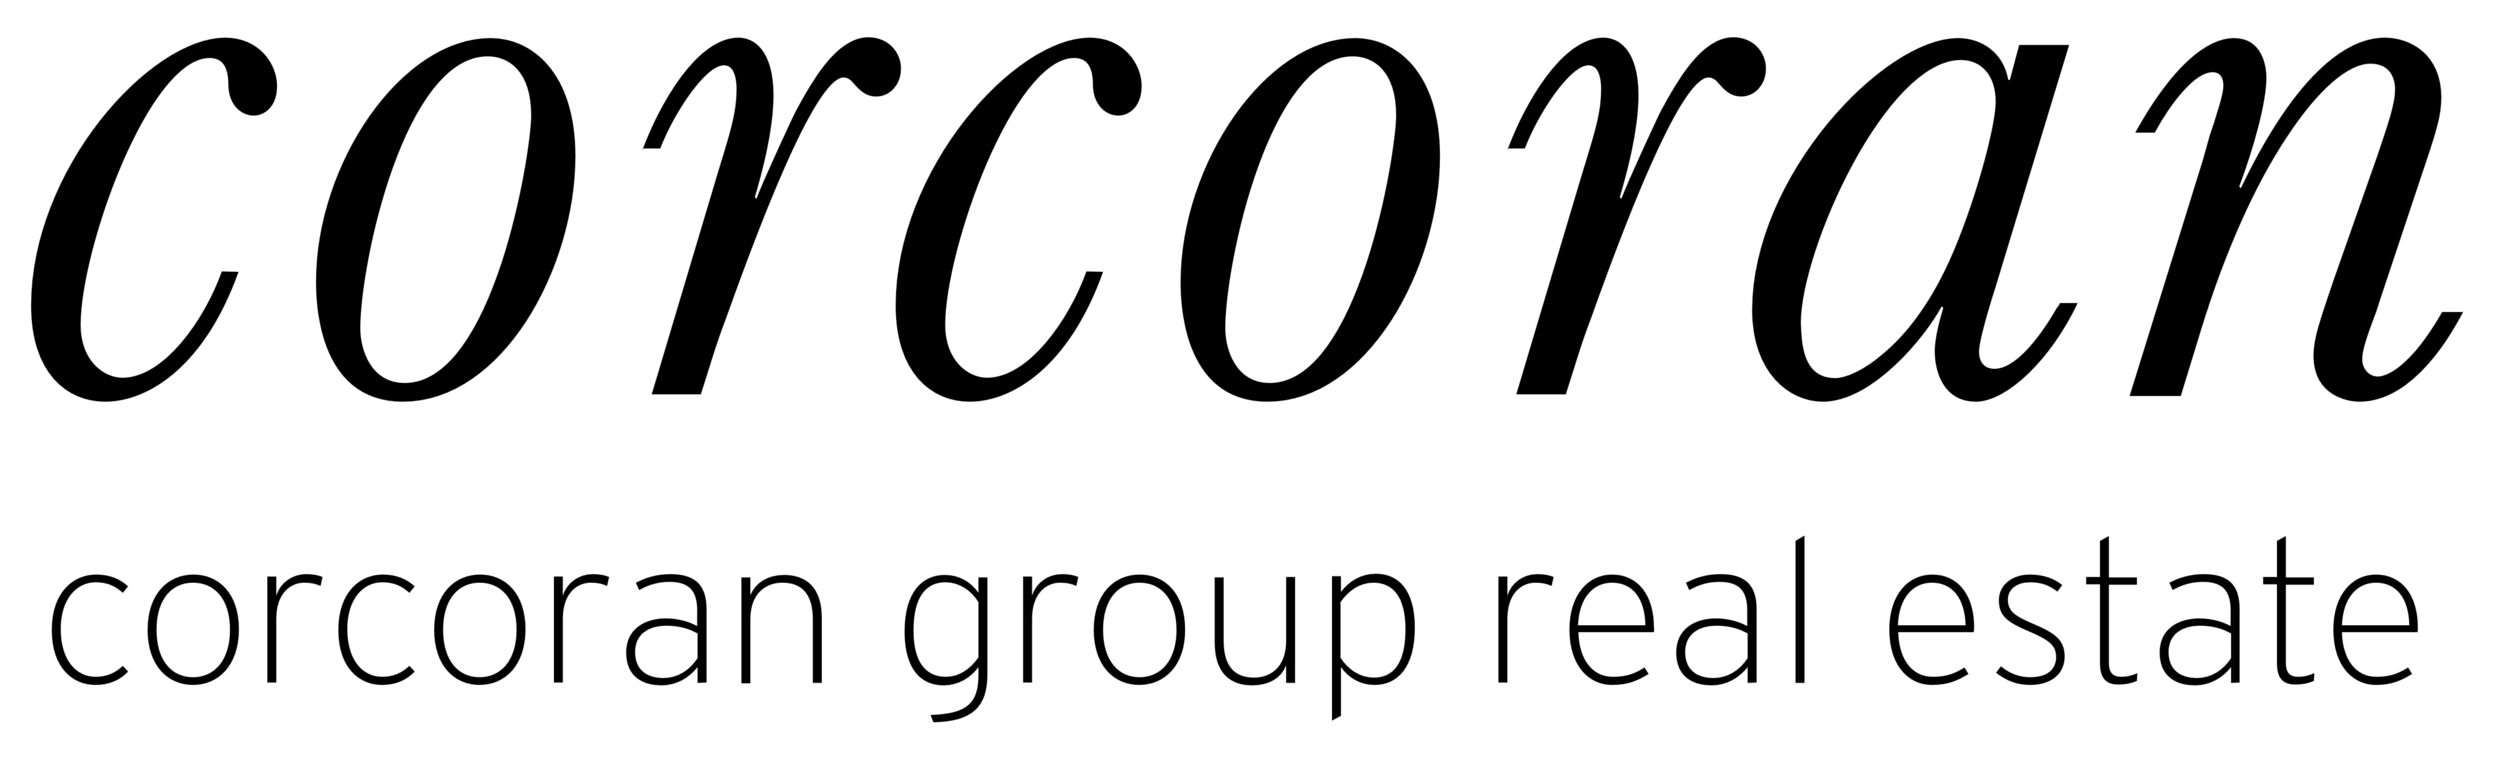 Corcoran_Group_logo_Real_Estate -- 4405x1350.png